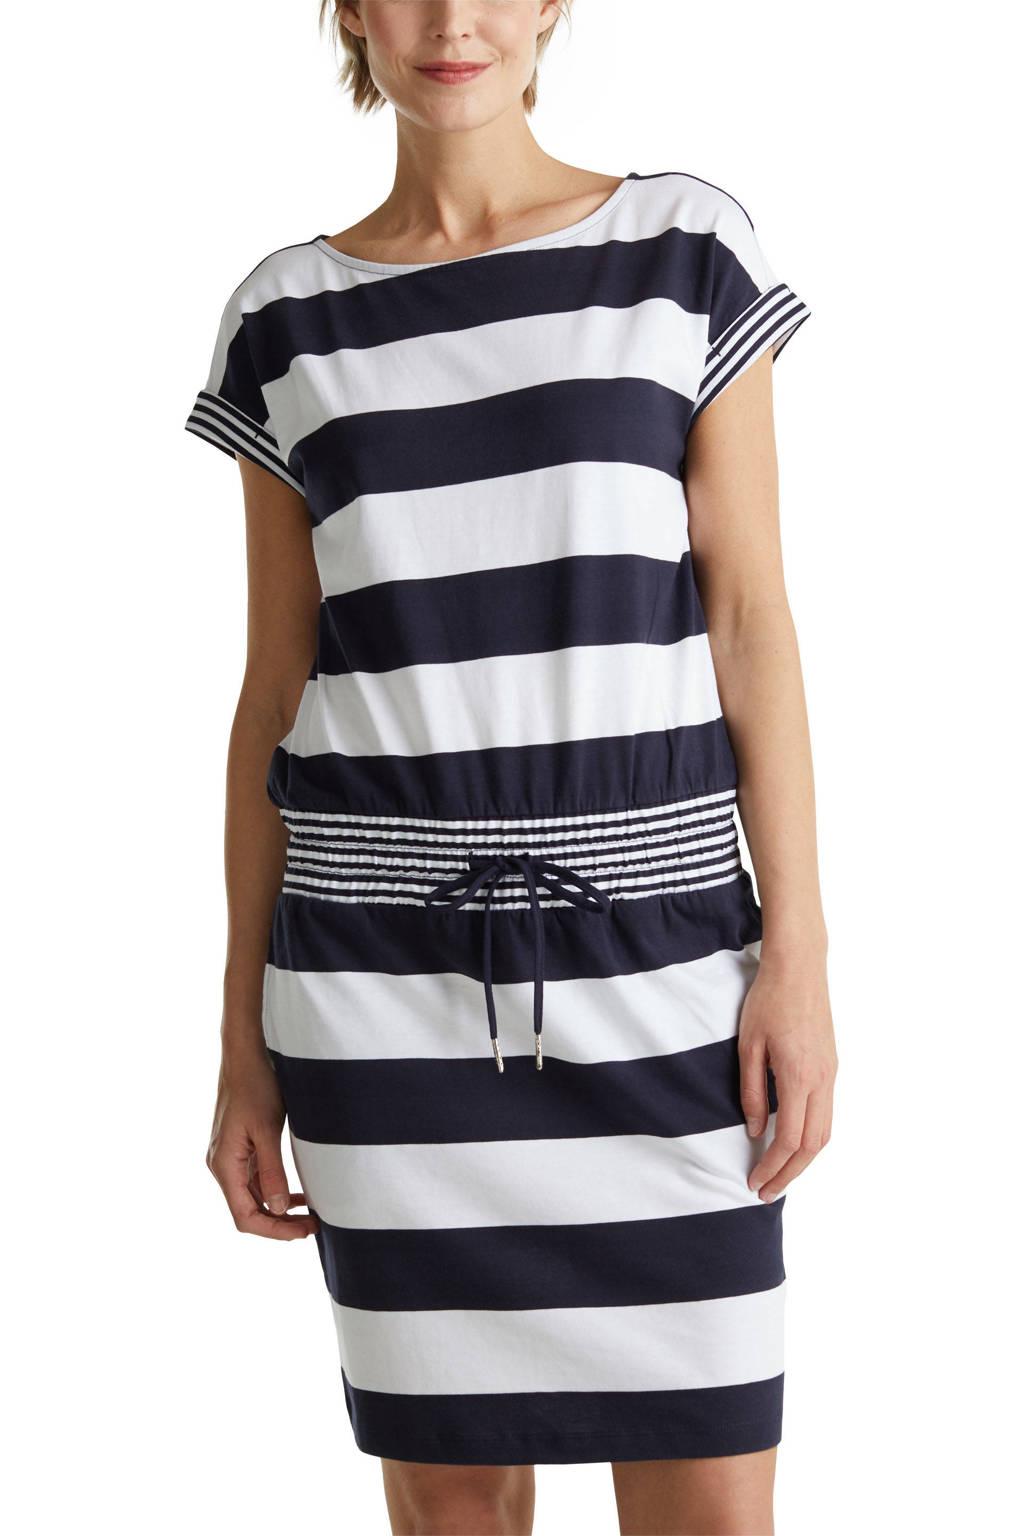 ESPRIT Women Casual gestreepte jersey jurk donkerblauw/wit, Donkerblauw/wit